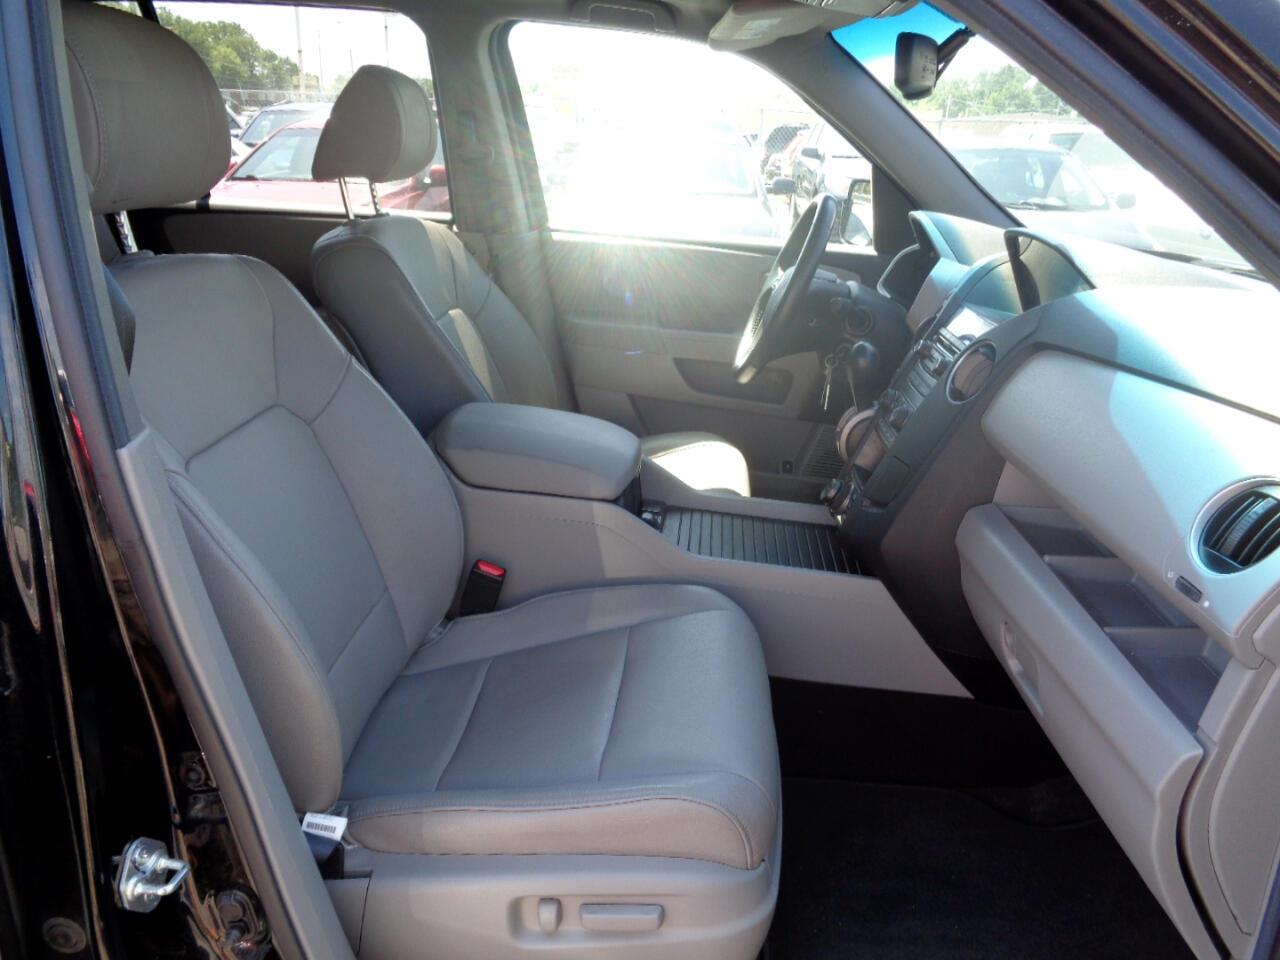 Honda Pilot EX-L 4WD 5-Spd AT with Navigation 2013